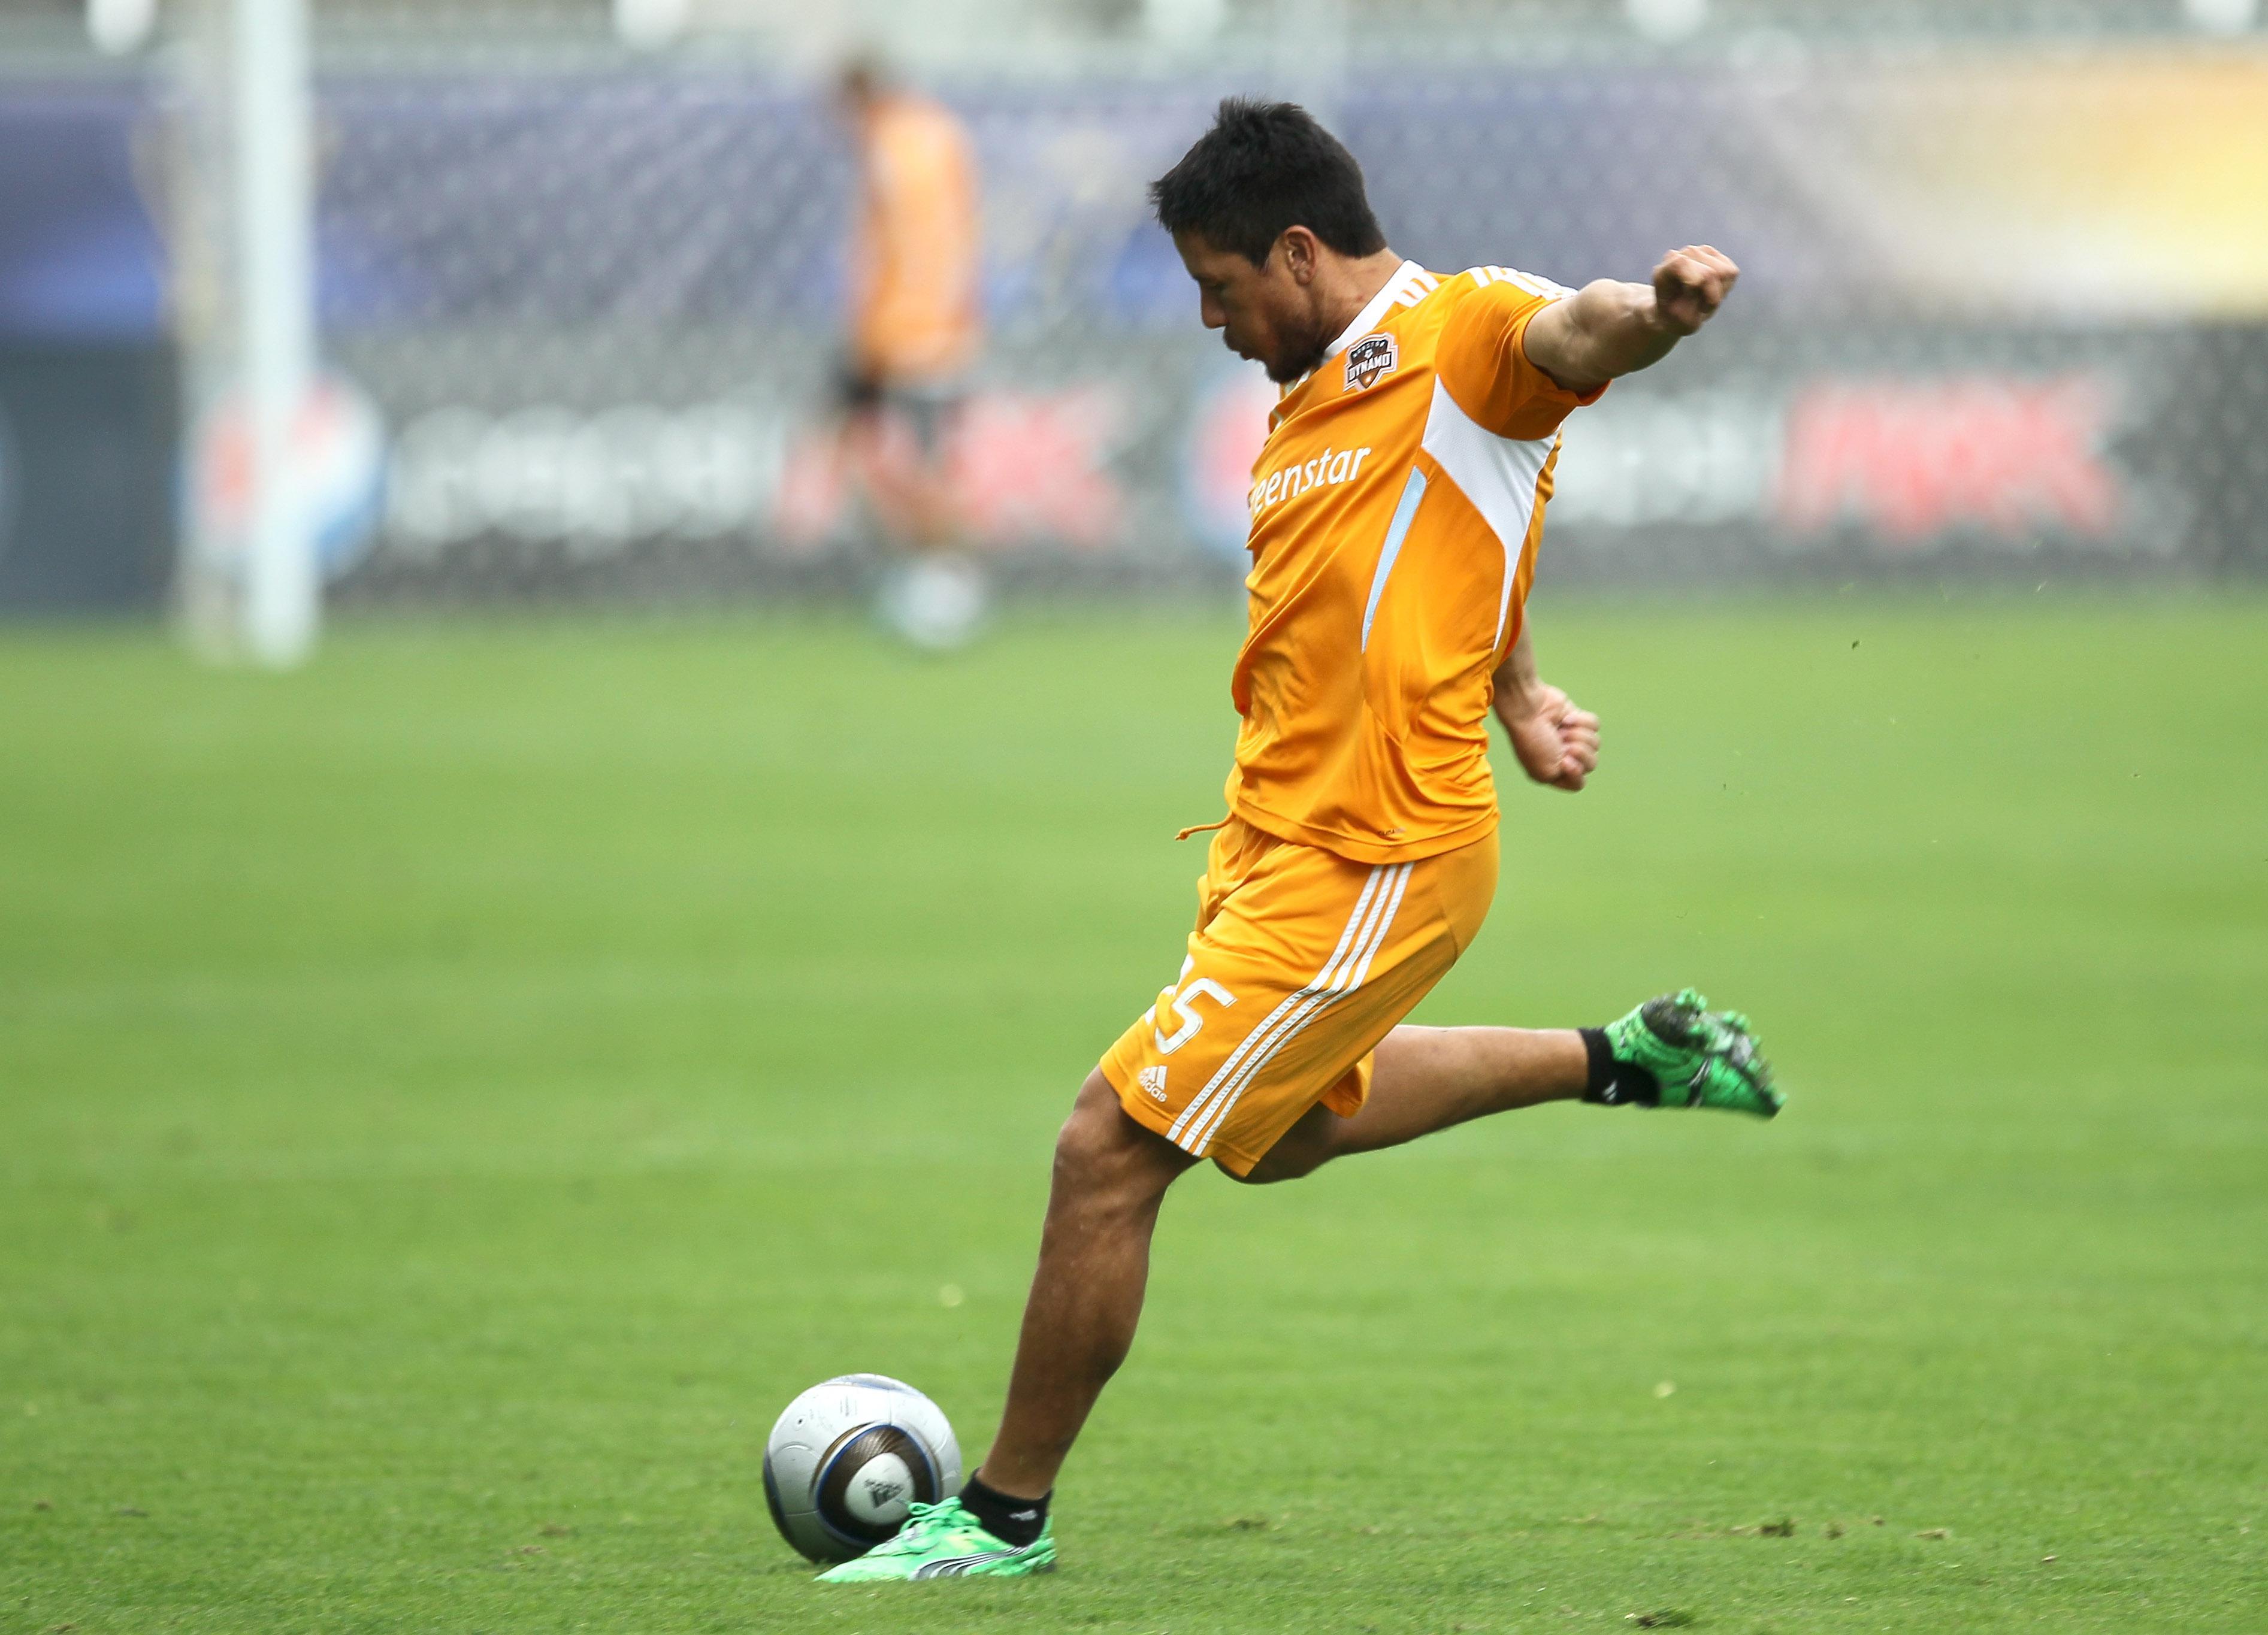 2011 MLS Cup - Houston Dynamo Training Session